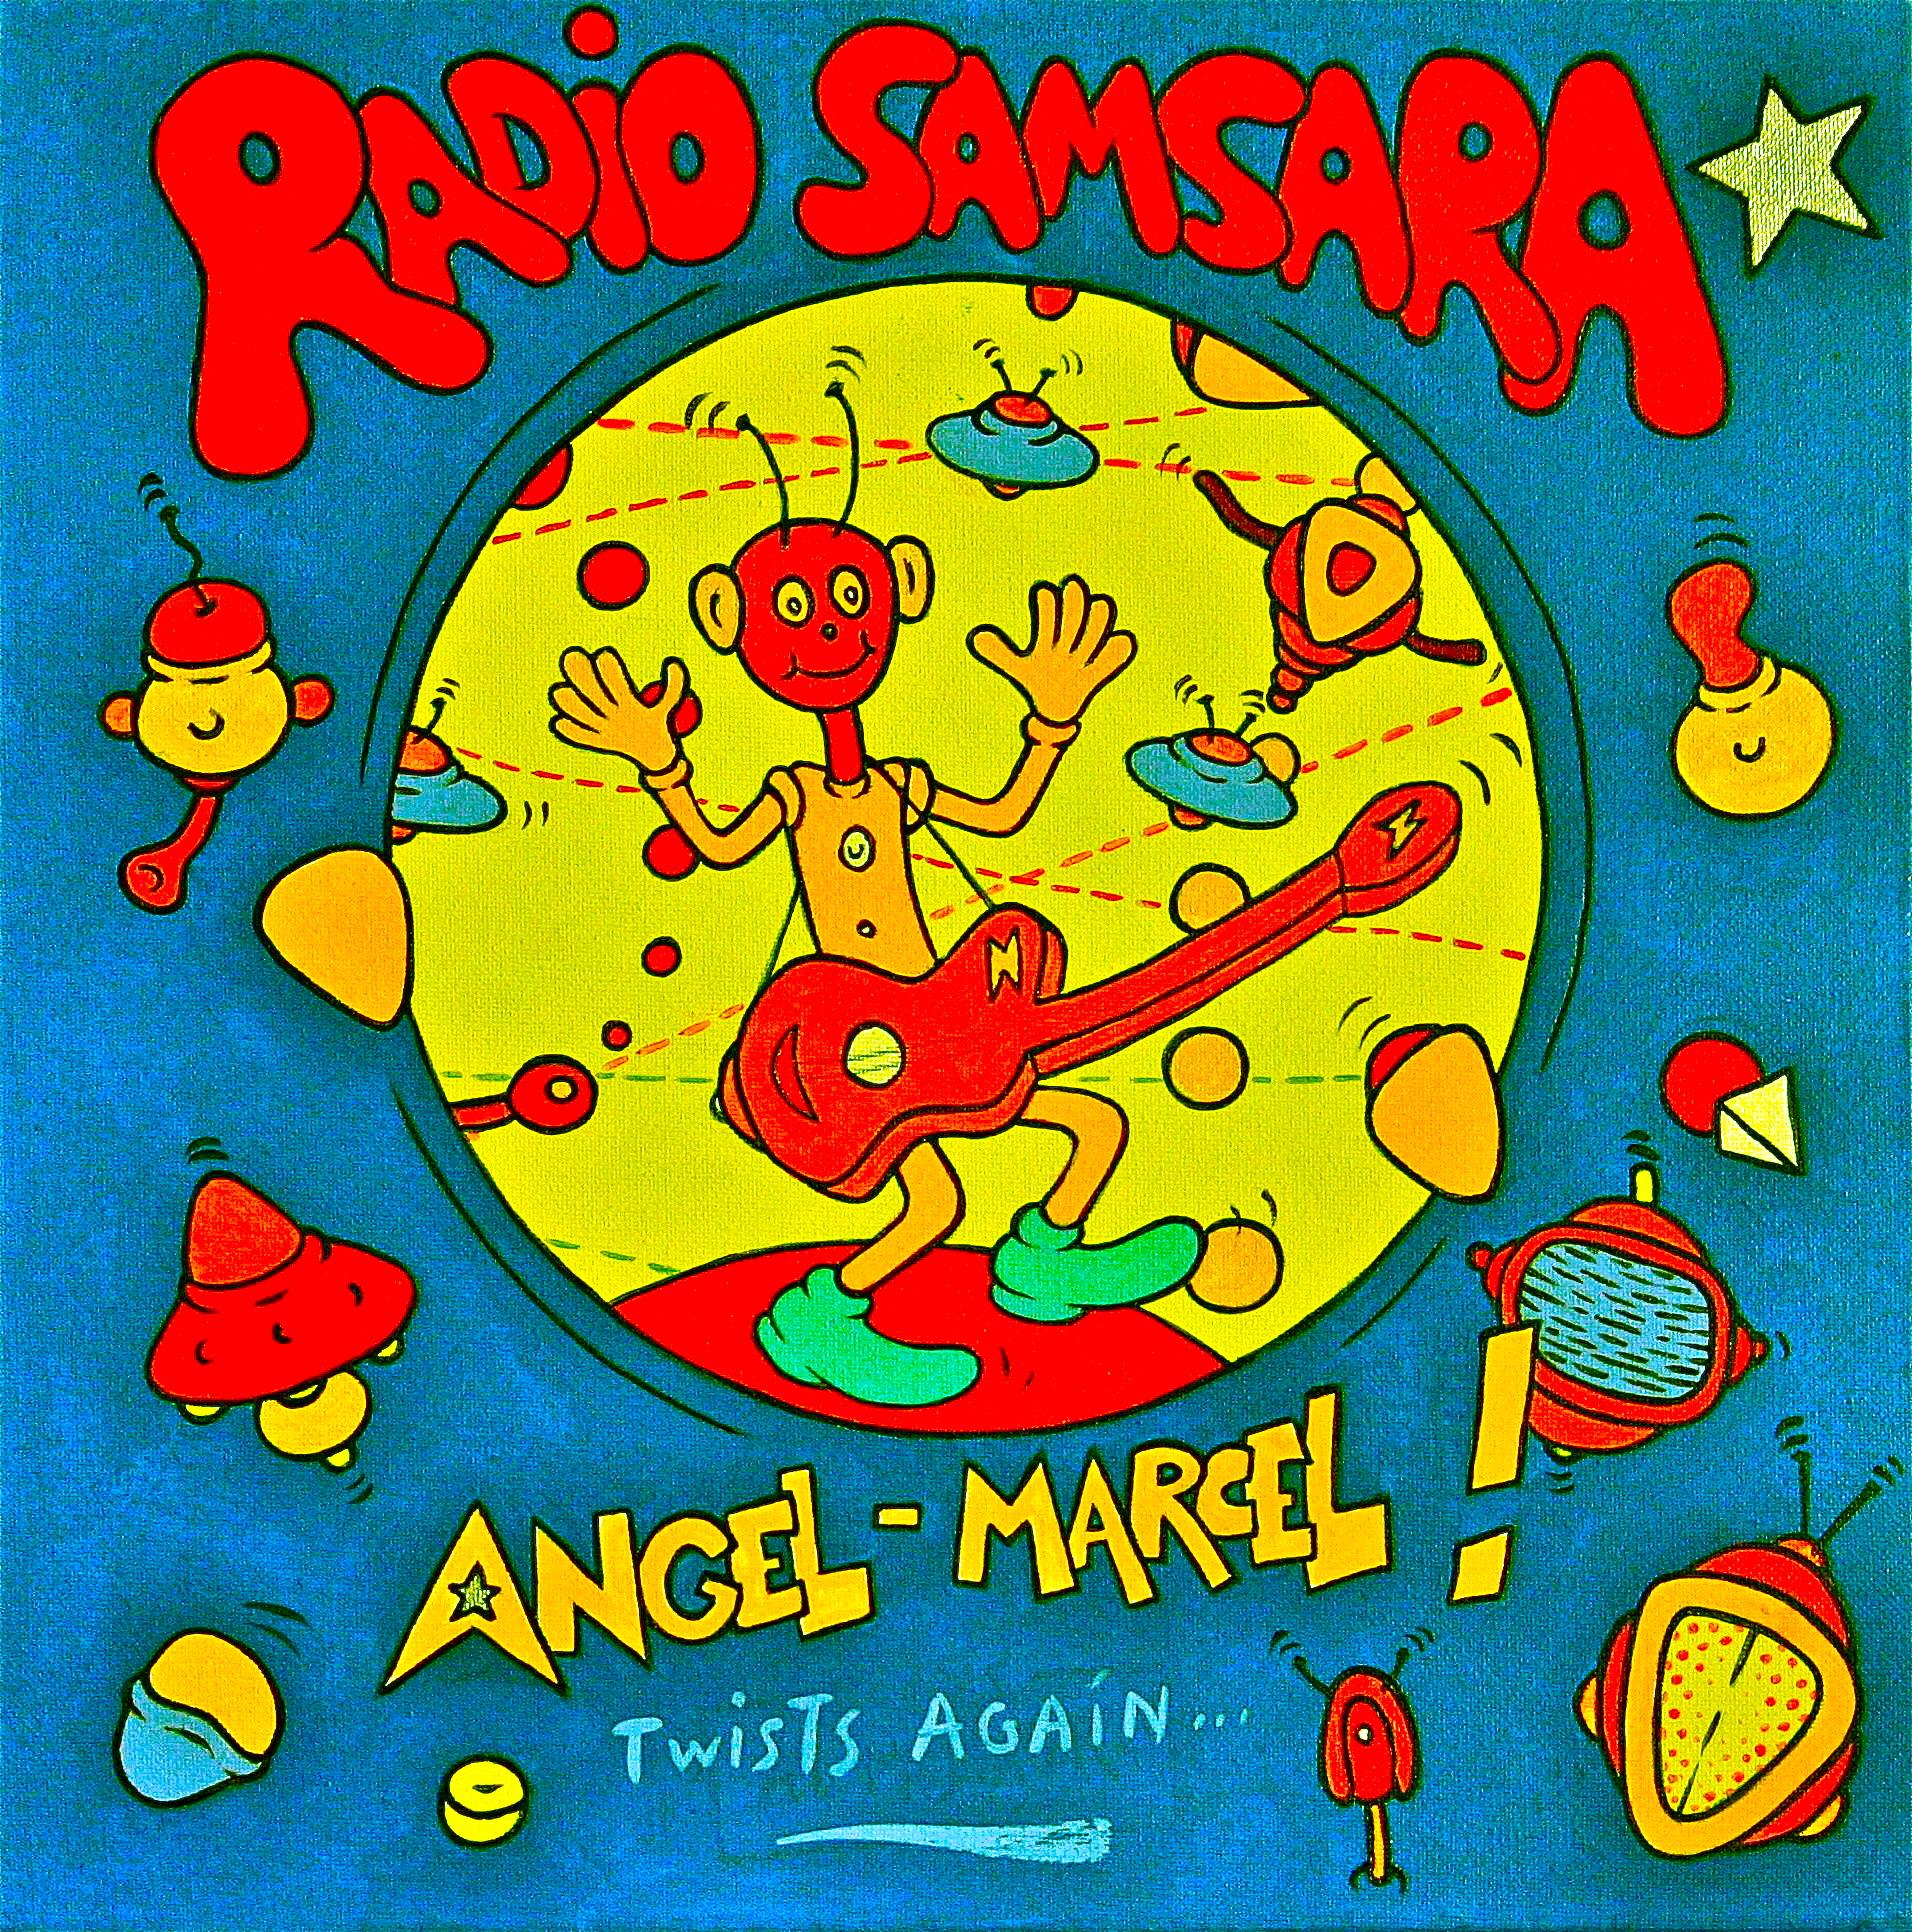 Radio-Samsara (30x30)